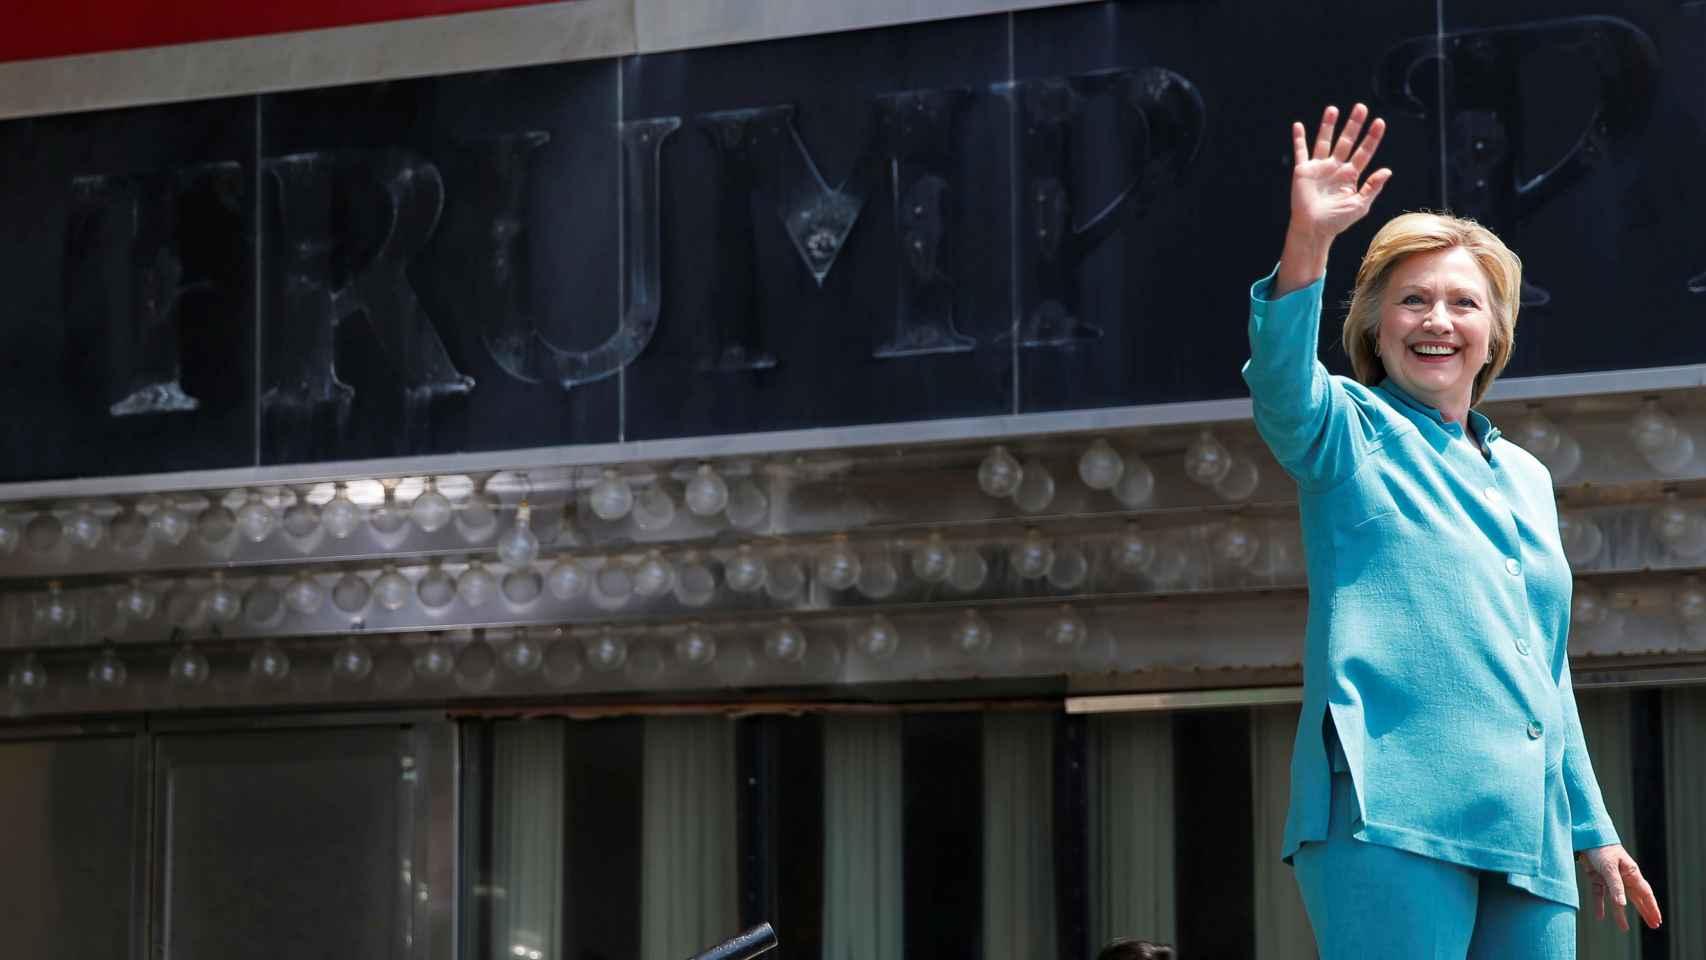 La candidata del partido demócrata, Hillary Clinton, en Atlantic City.